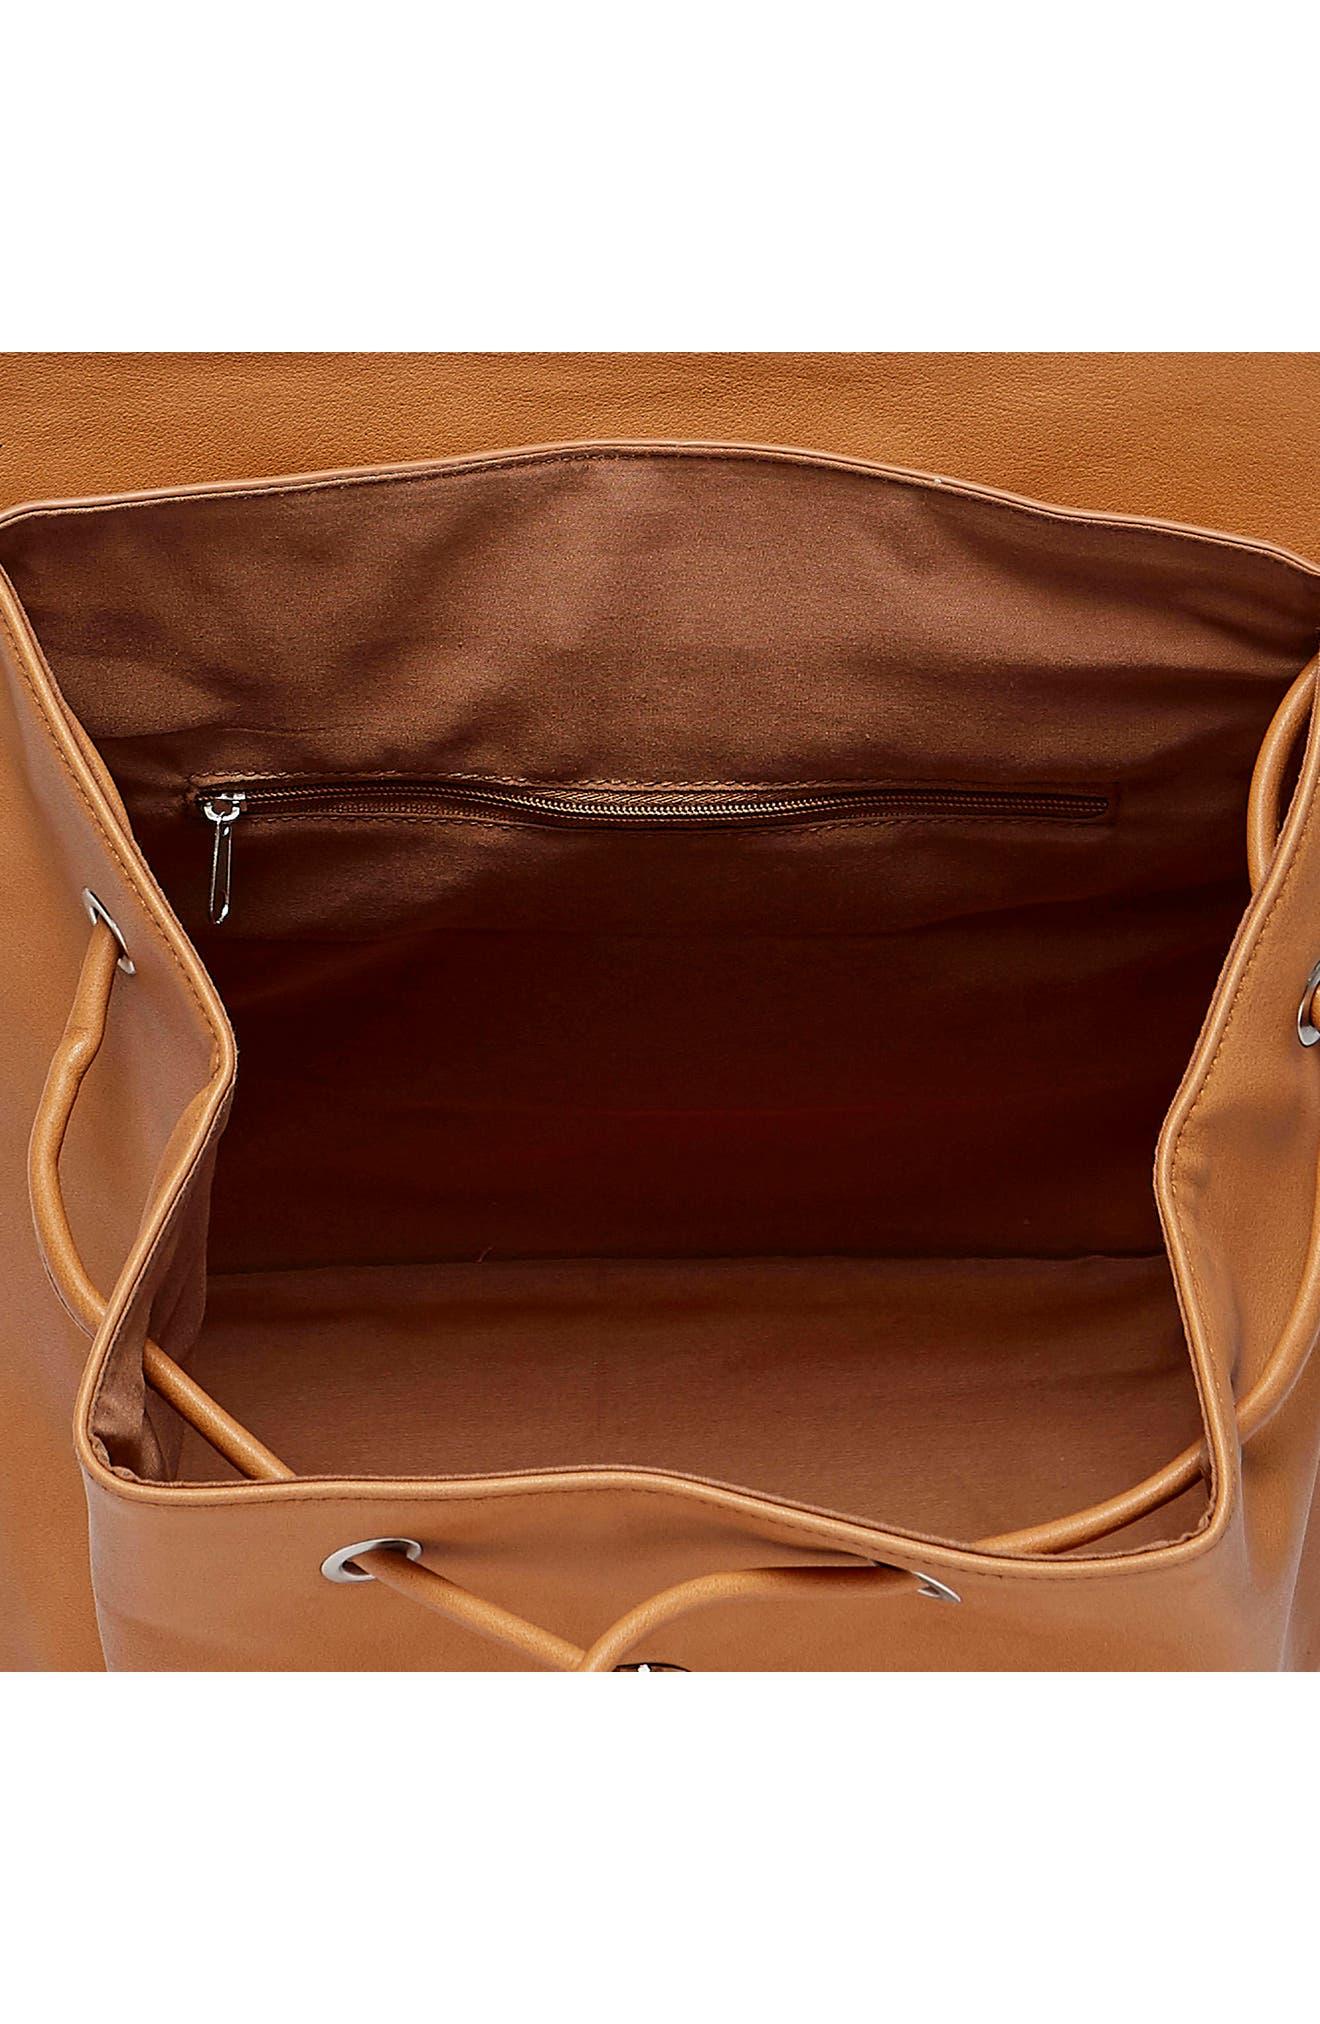 URBAN ORIGINALS, Midnight Vegan Leather Flap Backpack, Alternate thumbnail 3, color, 200